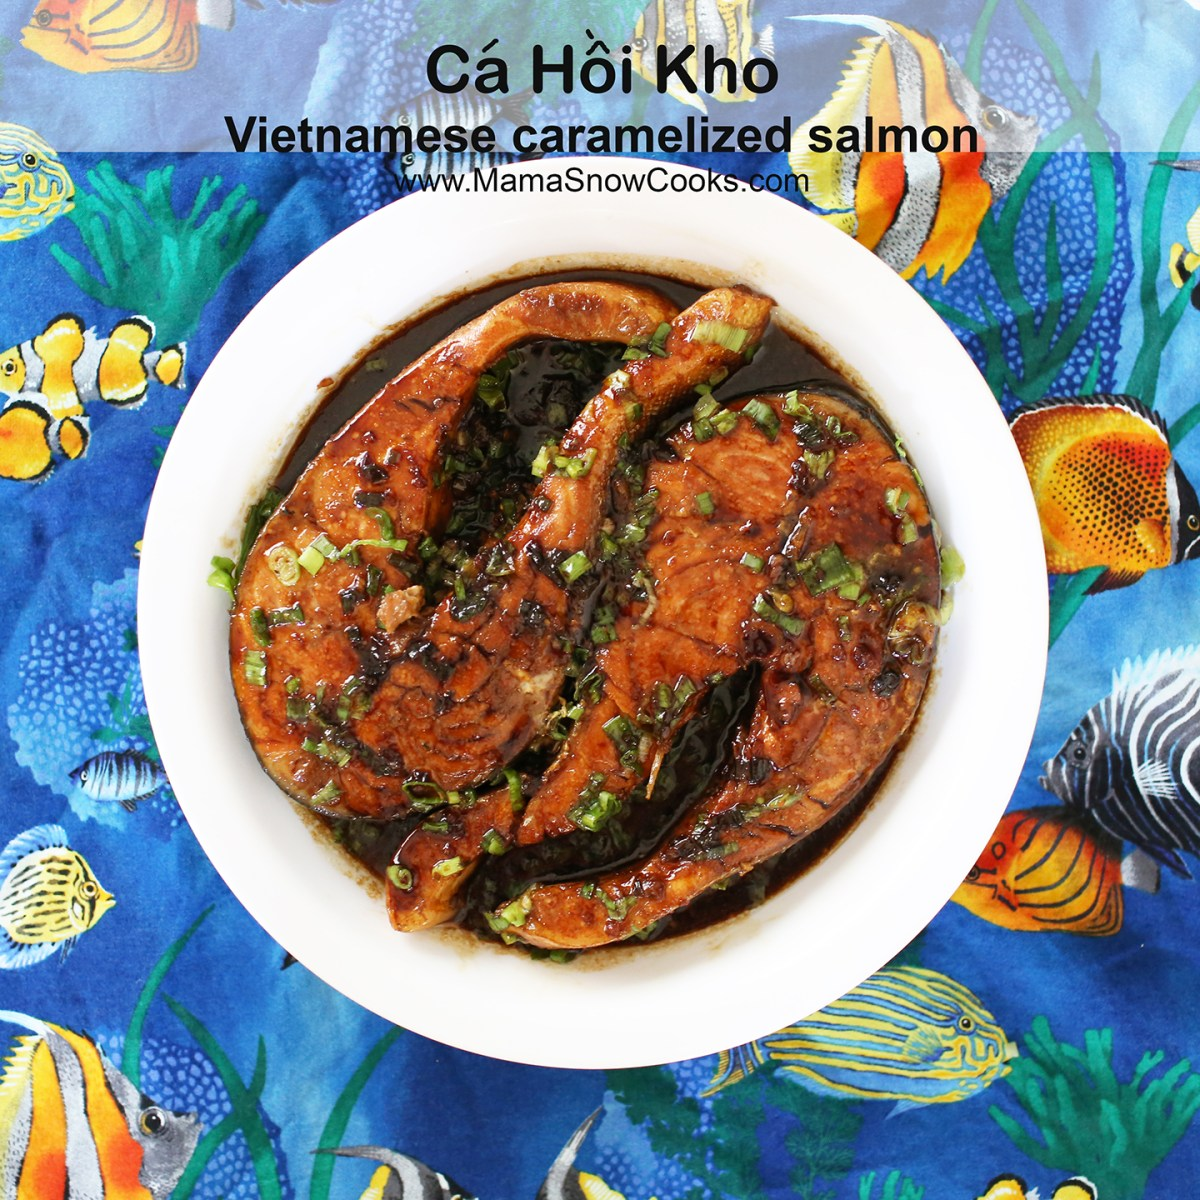 Vietnamese Caramelized Salmon - Ca Hoi Kho